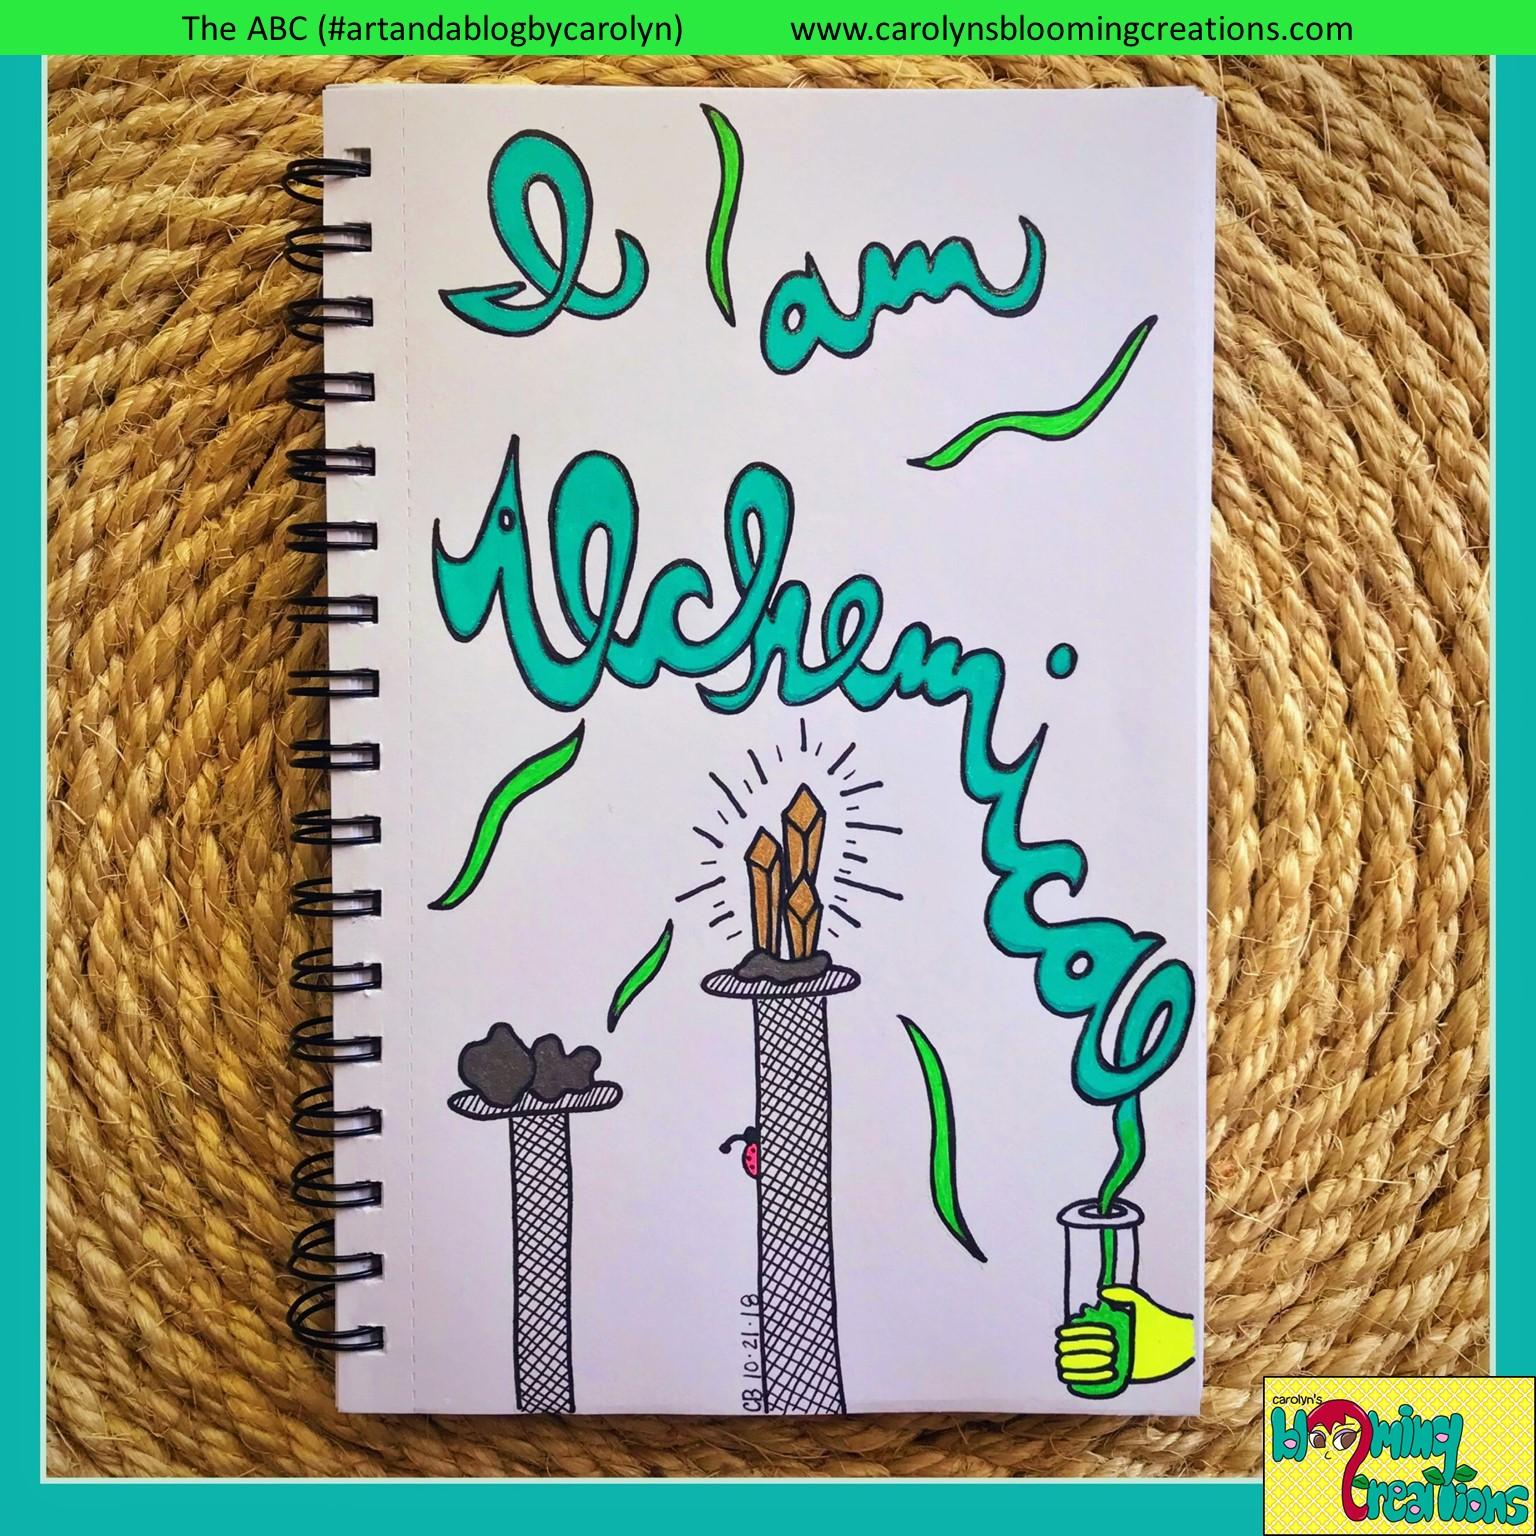 Art by Carolyn J. Braden, Media: Gelly Roll pens by Sakura, Sharpie Marker and BIC pencil on paper.